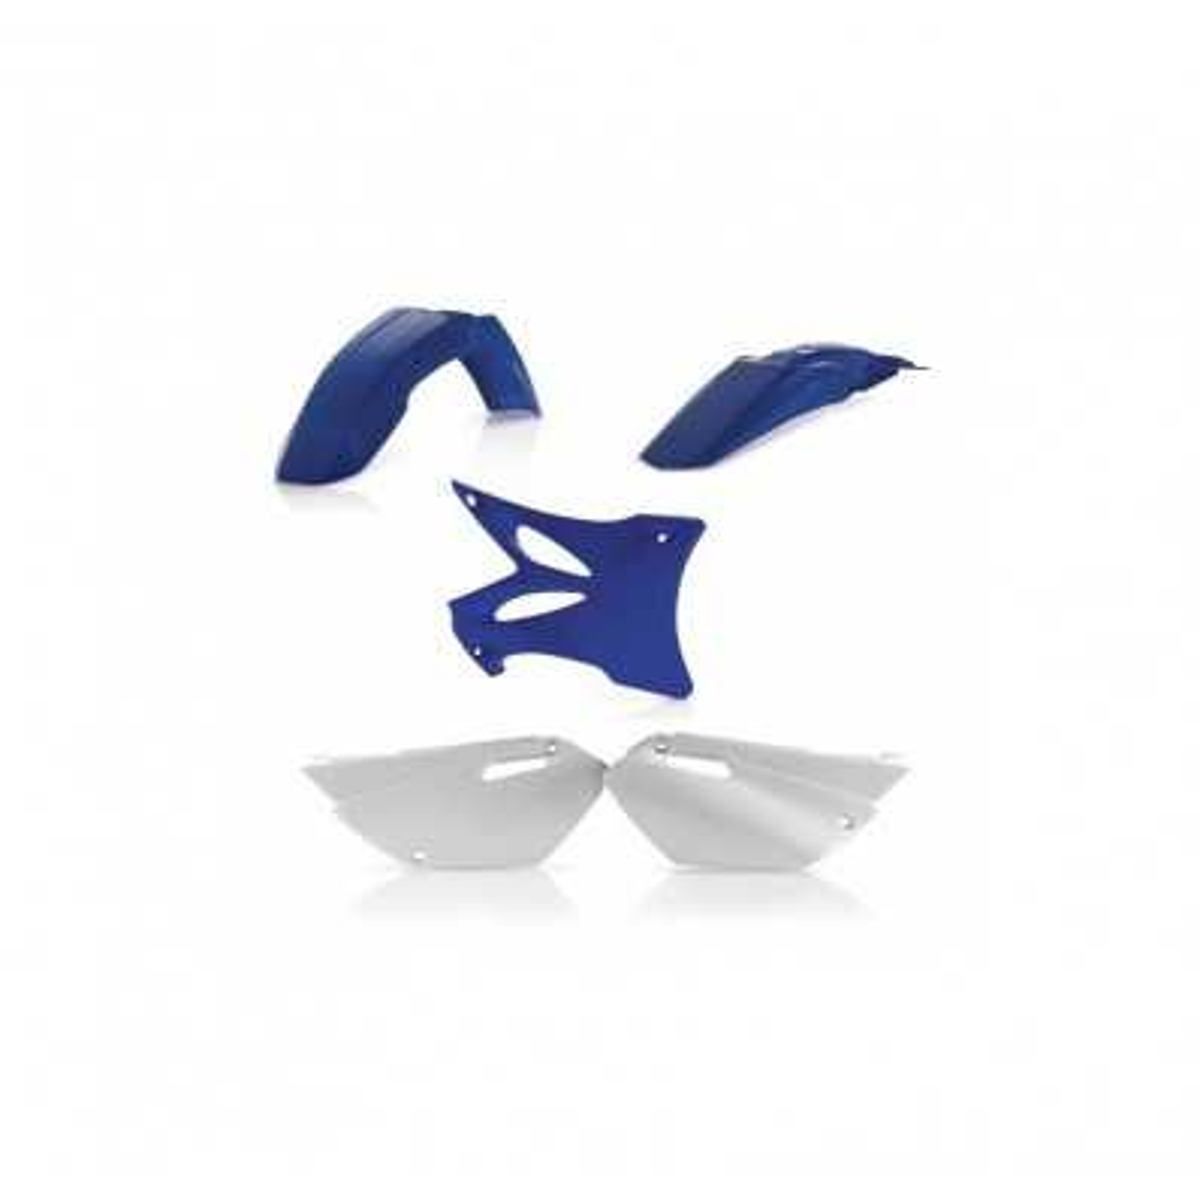 0023089-040 - Kit Plasticos Wrf 250 18 Azul